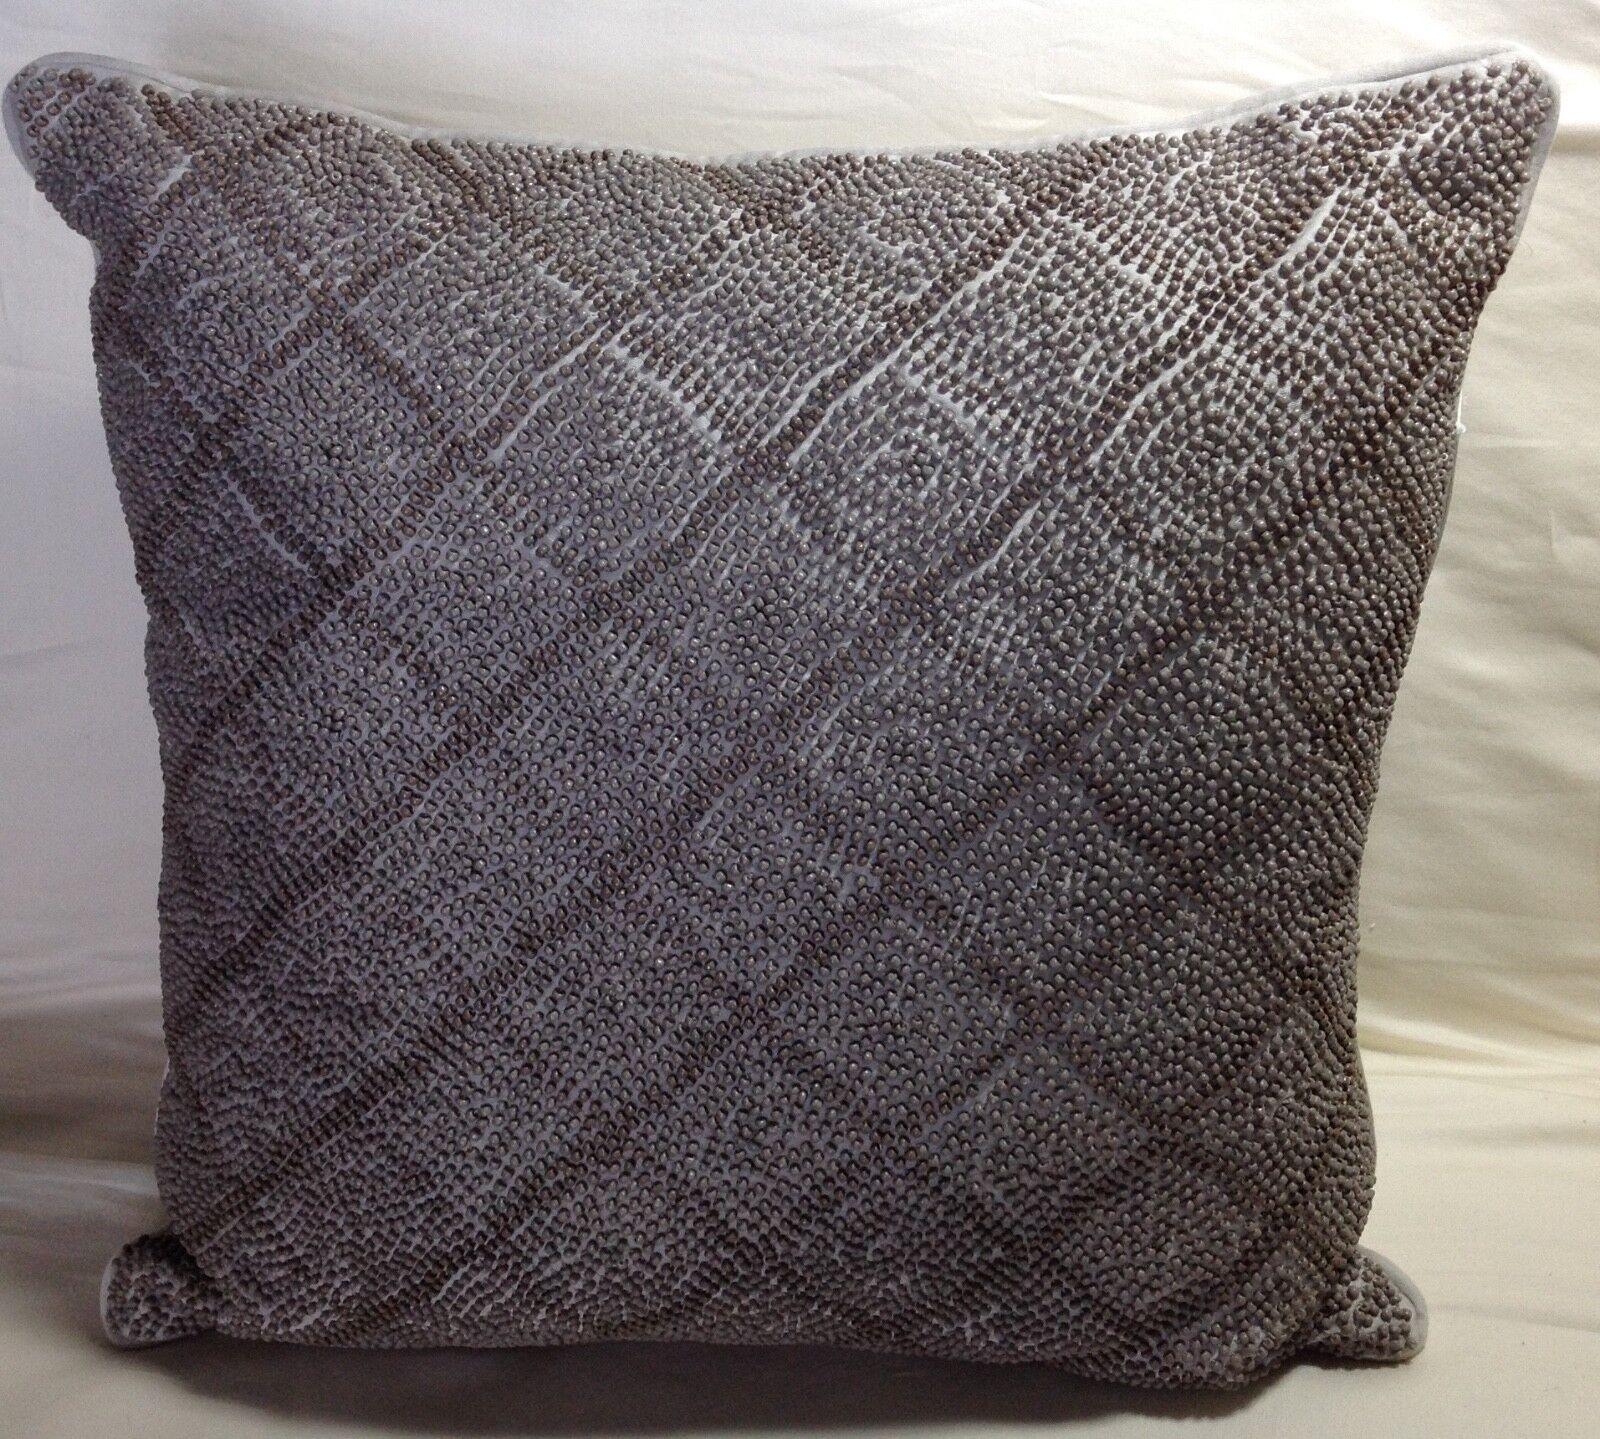 1872 Bloomingdale's Multi Beaded Decorative Pillow 18 x 18 Bronze Retail  260